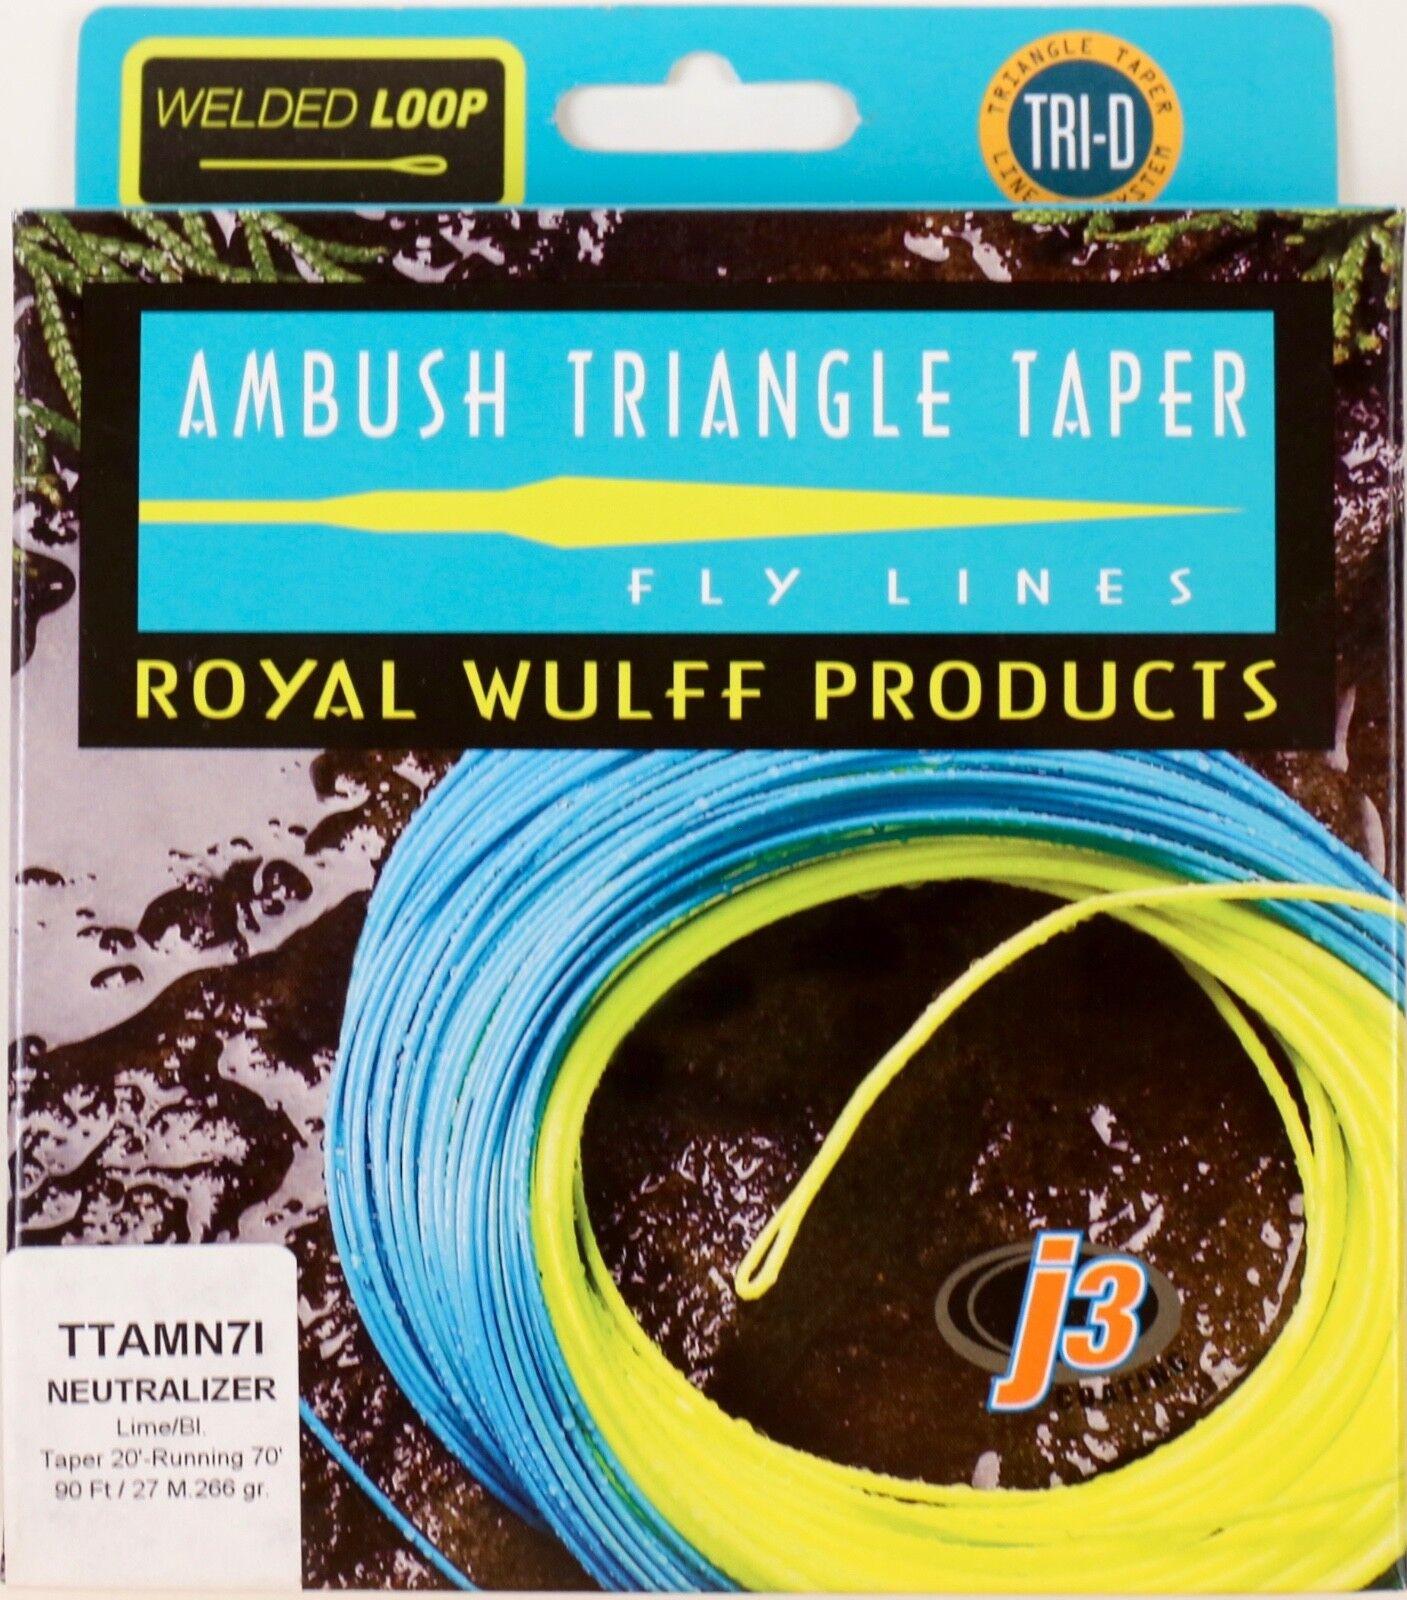 Royal Wulff Ambush Neutralizer Taper 7 WT Line Free Fast Shipping TTAMN7I